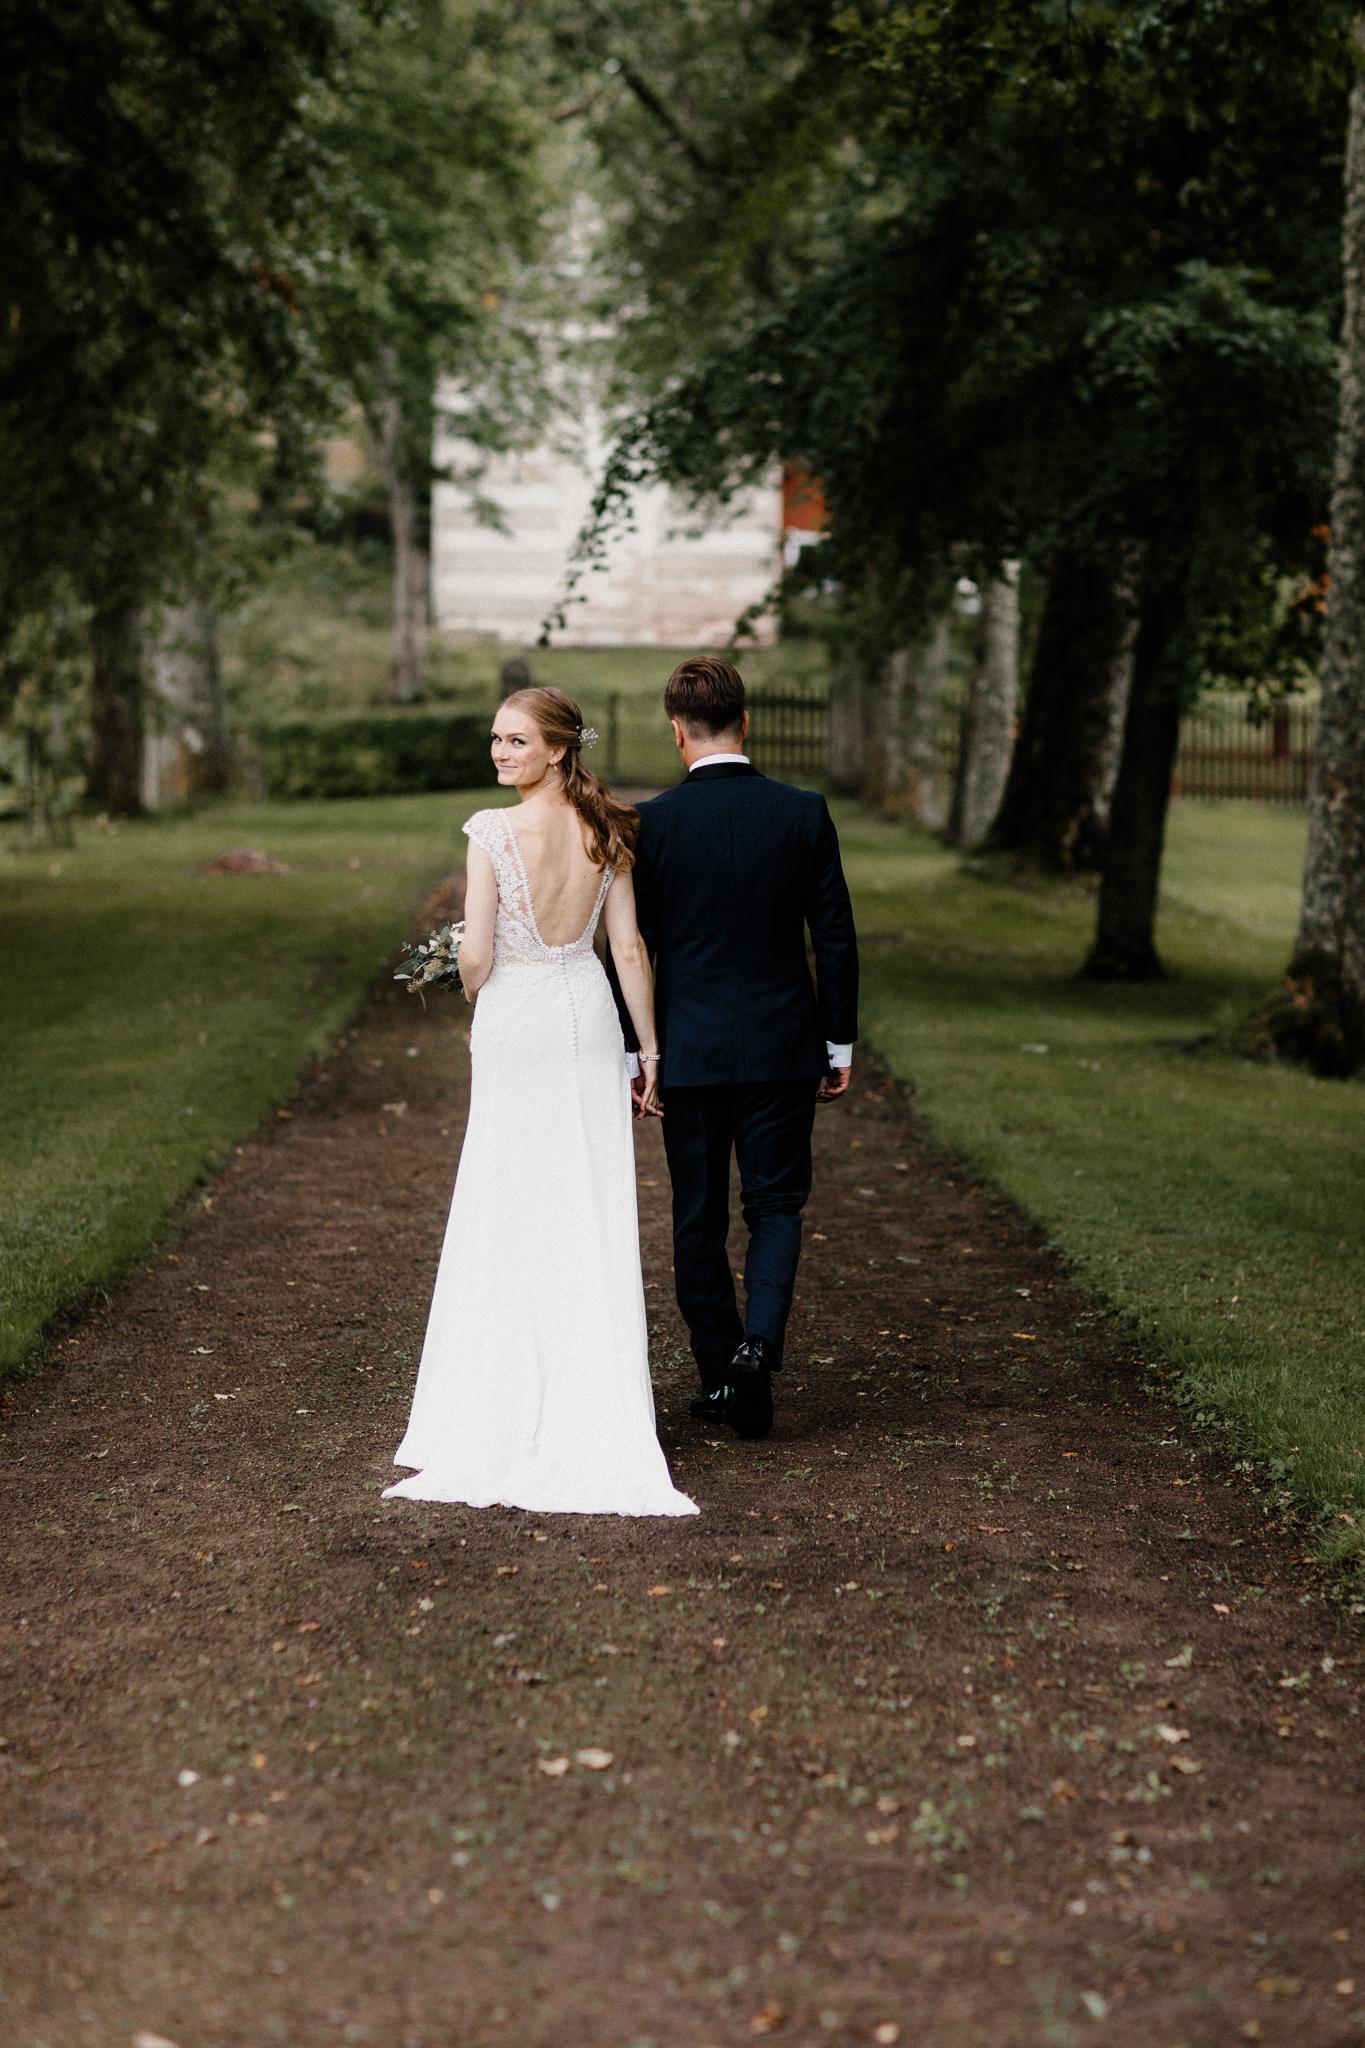 Jessica + Patrick | Fagervik | by Patrick Karkkolainen Wedding Photography-31.jpg